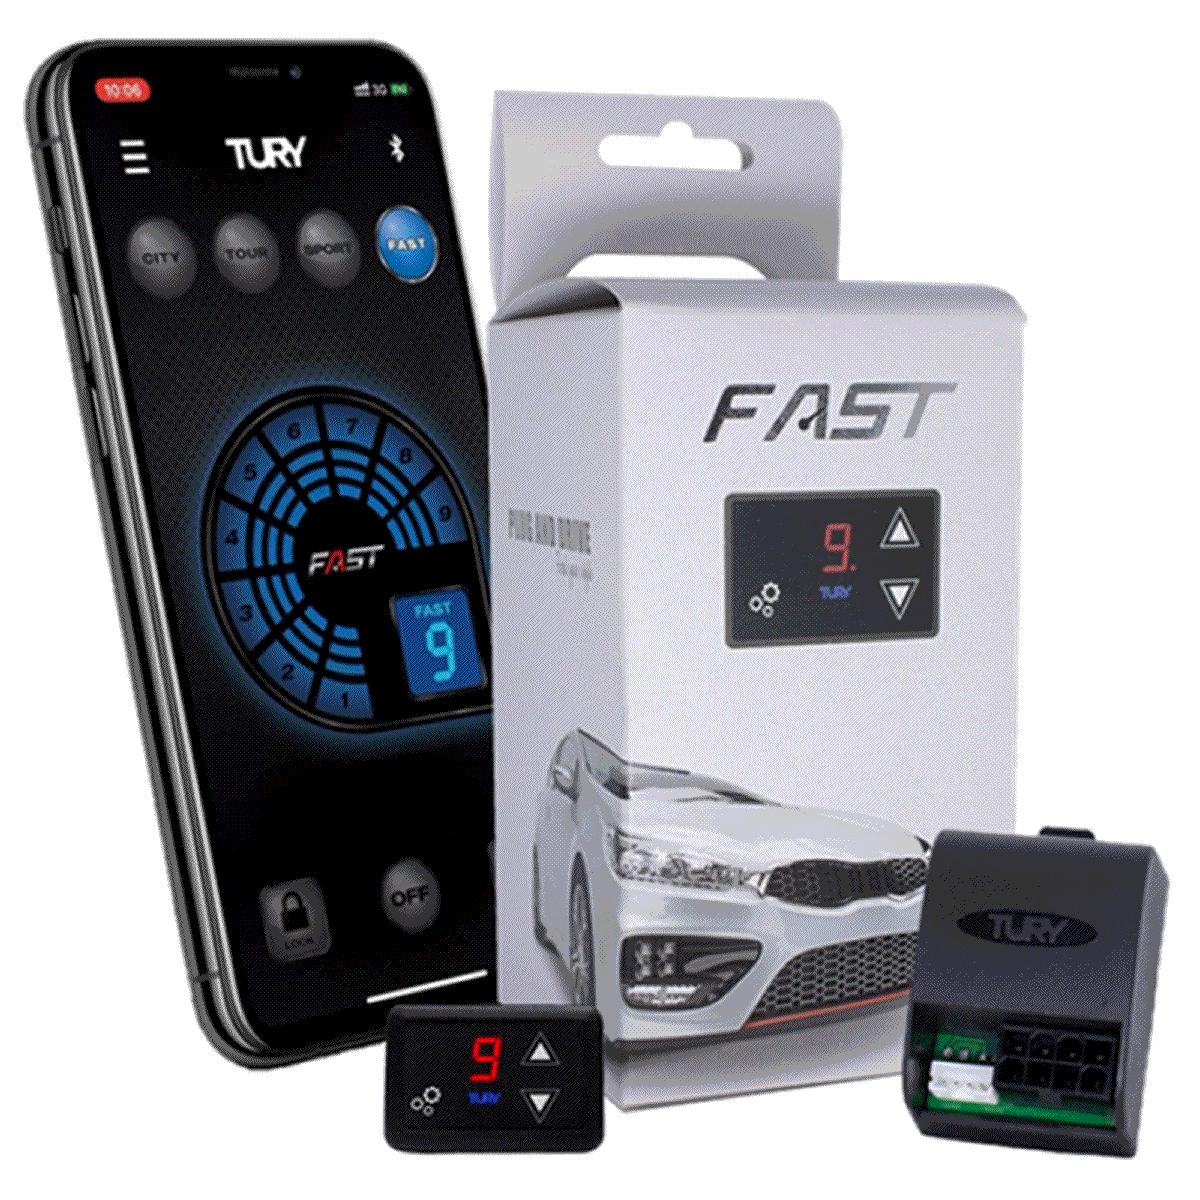 Fast 2.0 AA Mitsubishi Módulo Acelerador Plug & Play